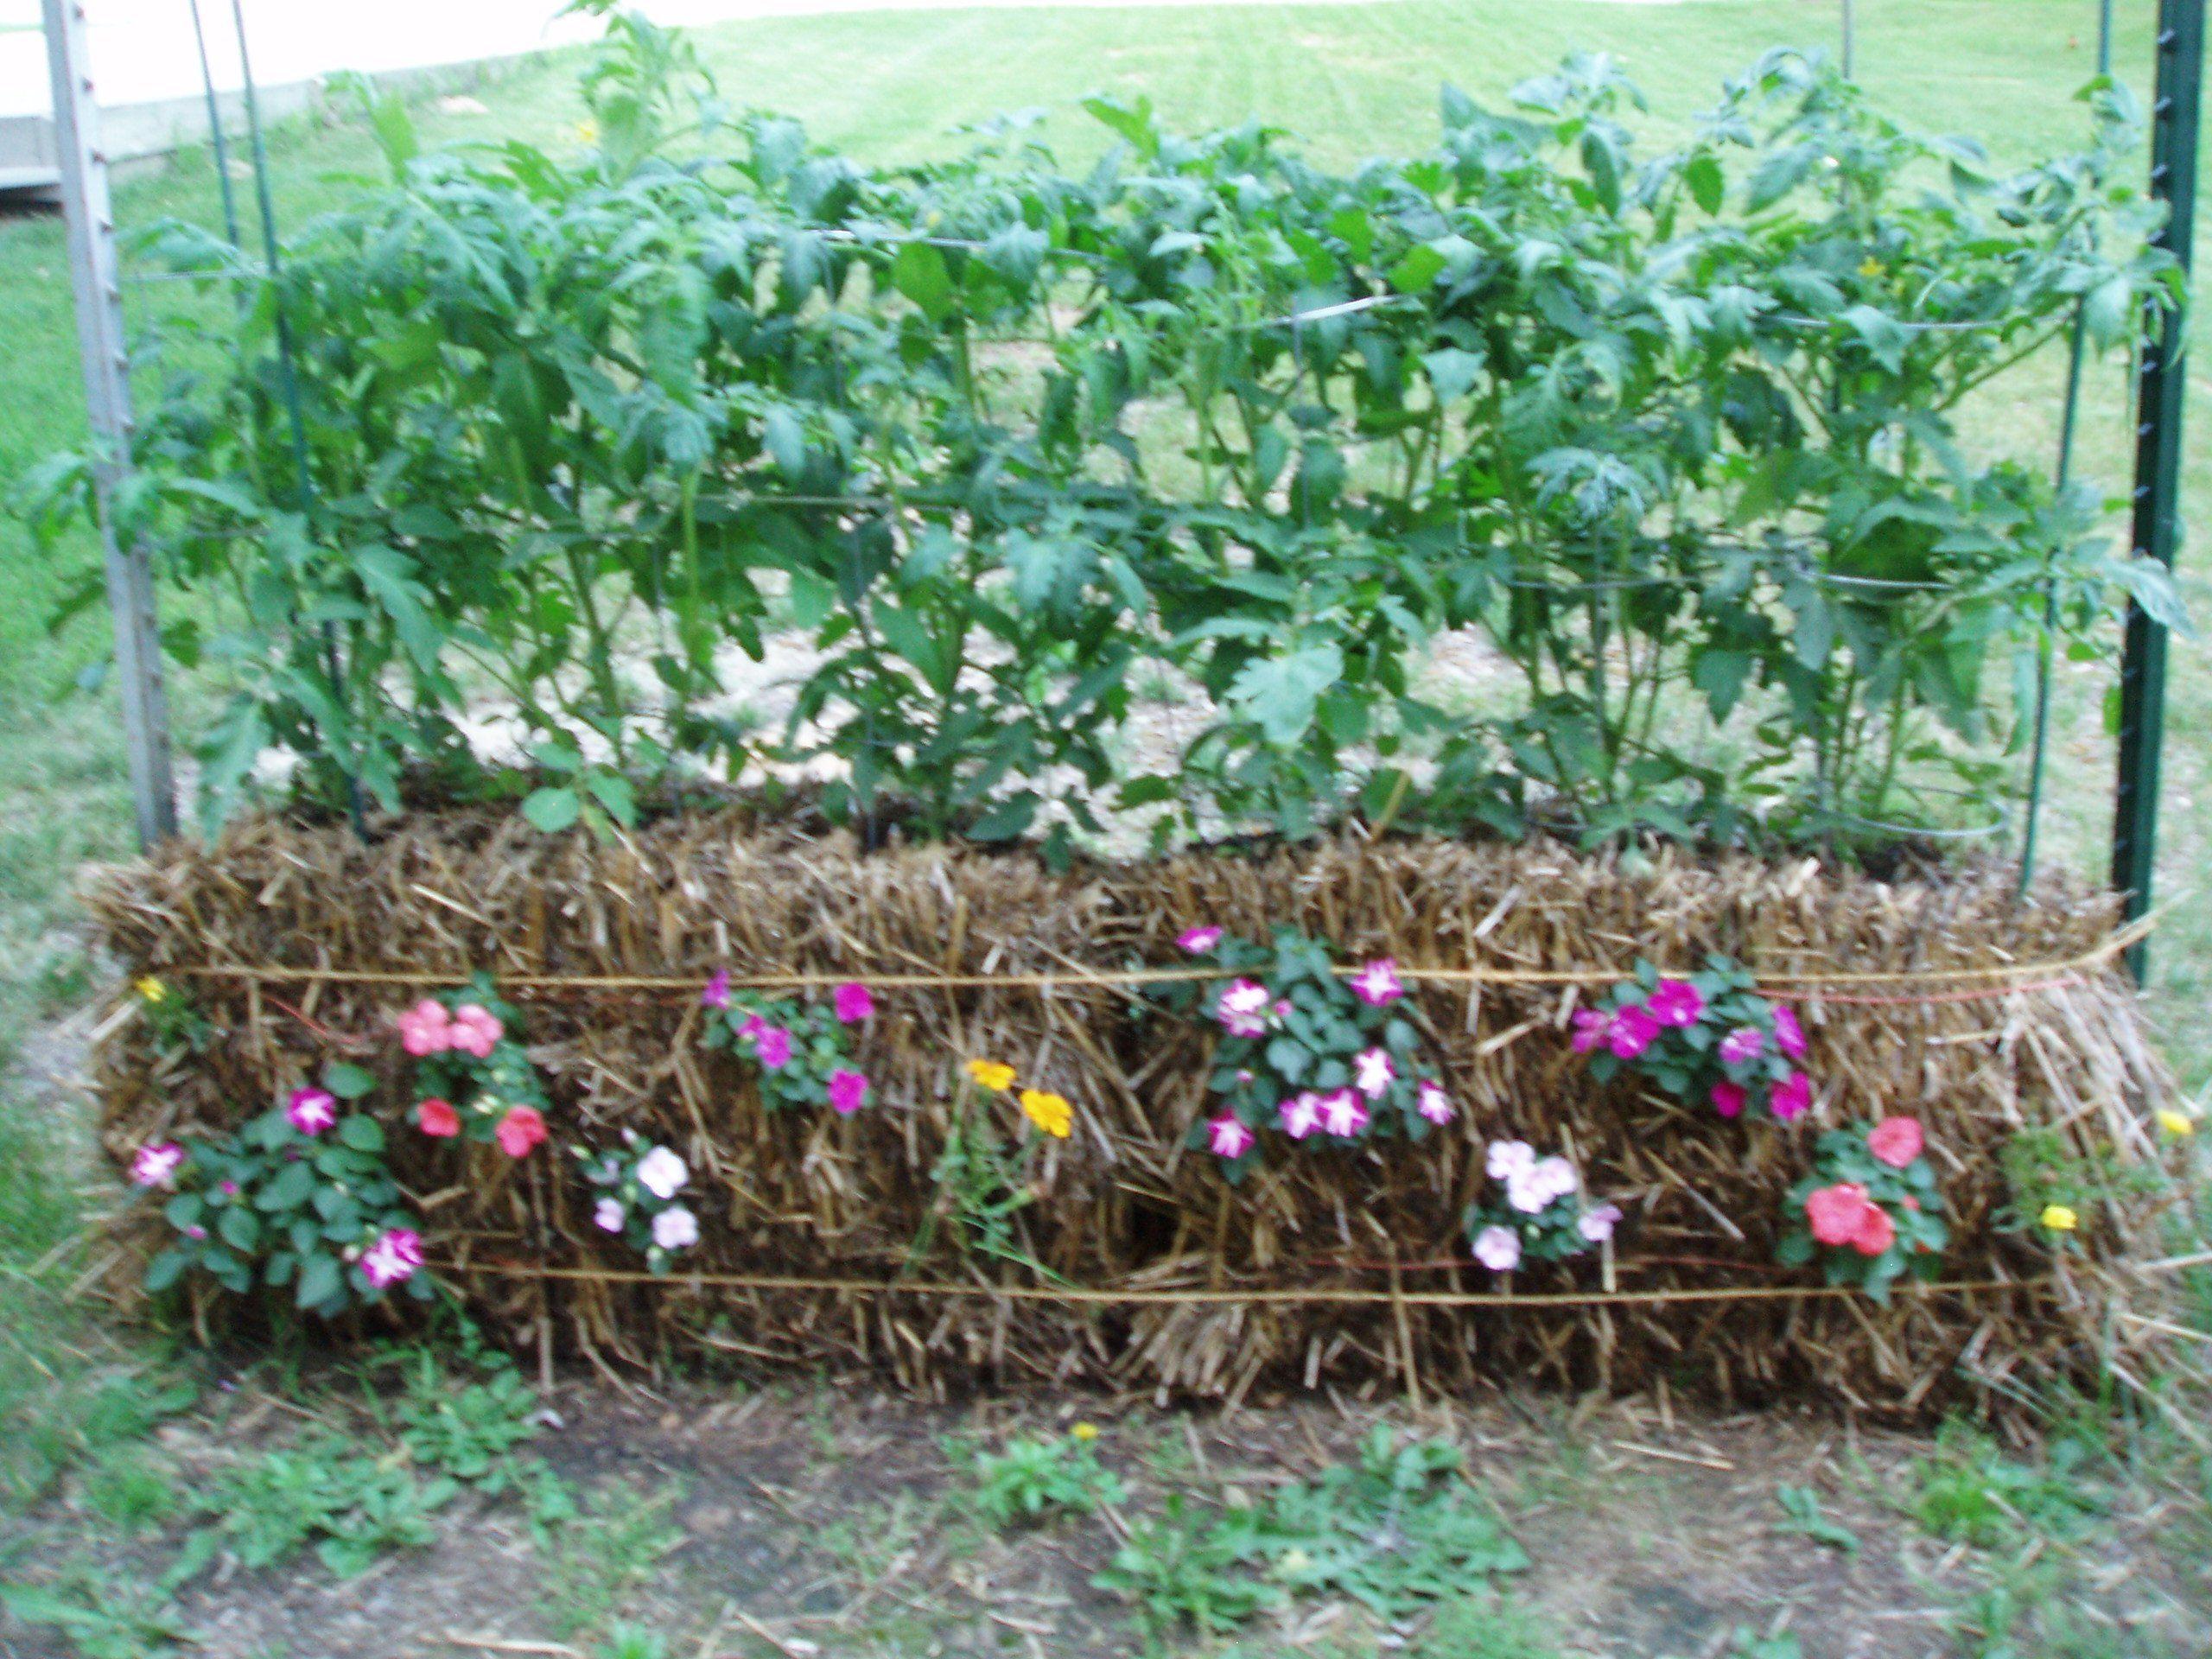 The science of straw bale gardening with joel karsten straw bales and gardens for Straw bale gardening joel karsten